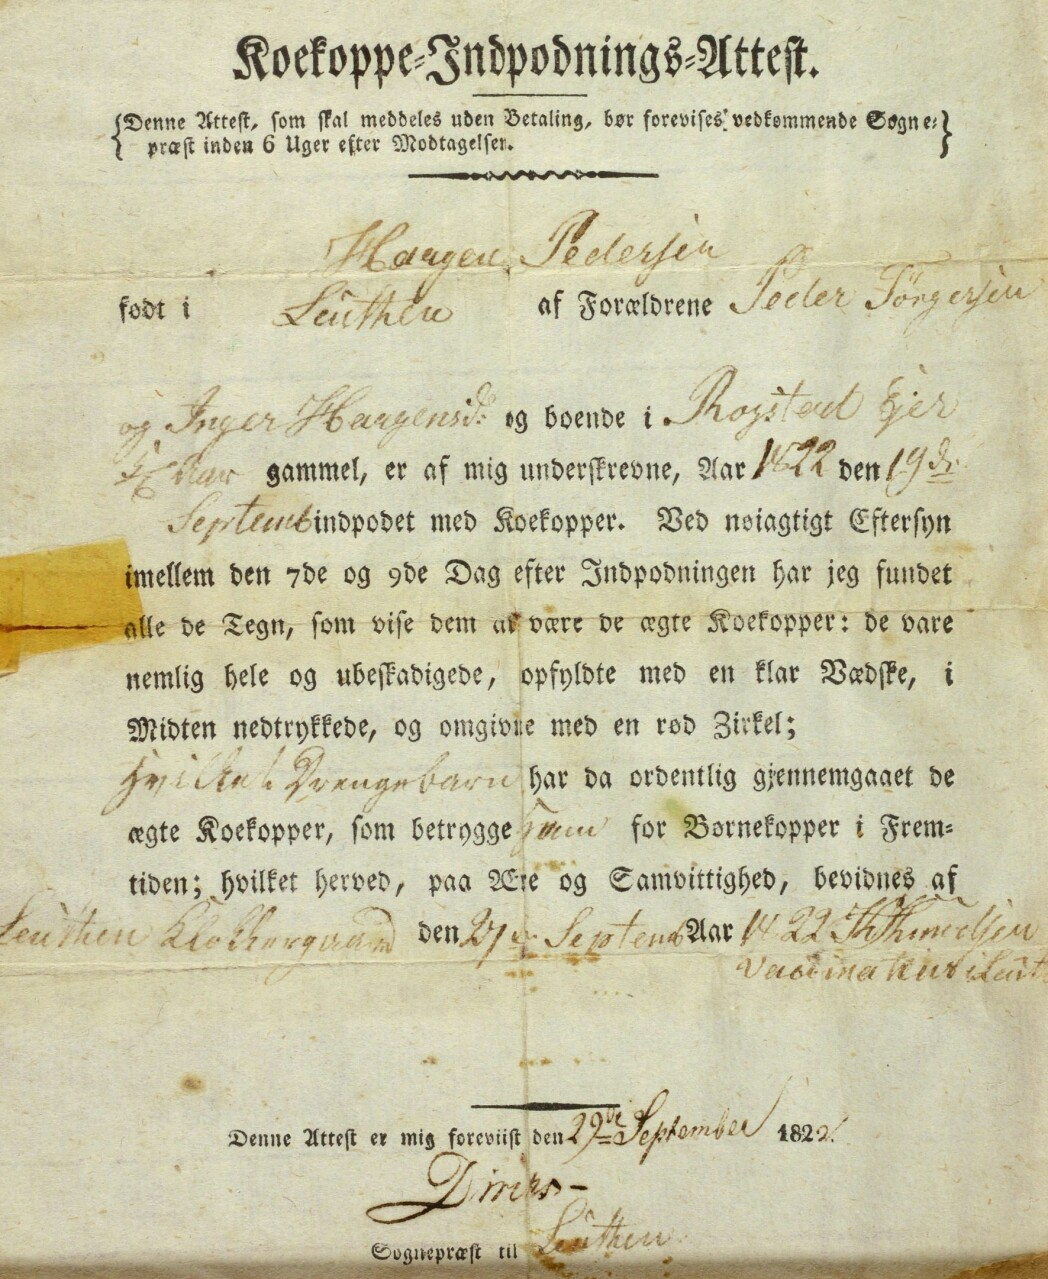 Sognepresten i Løten underskrev attesten som viste at Haagen Pedersen hadde blitt vaksinert med kukopper i 1822.